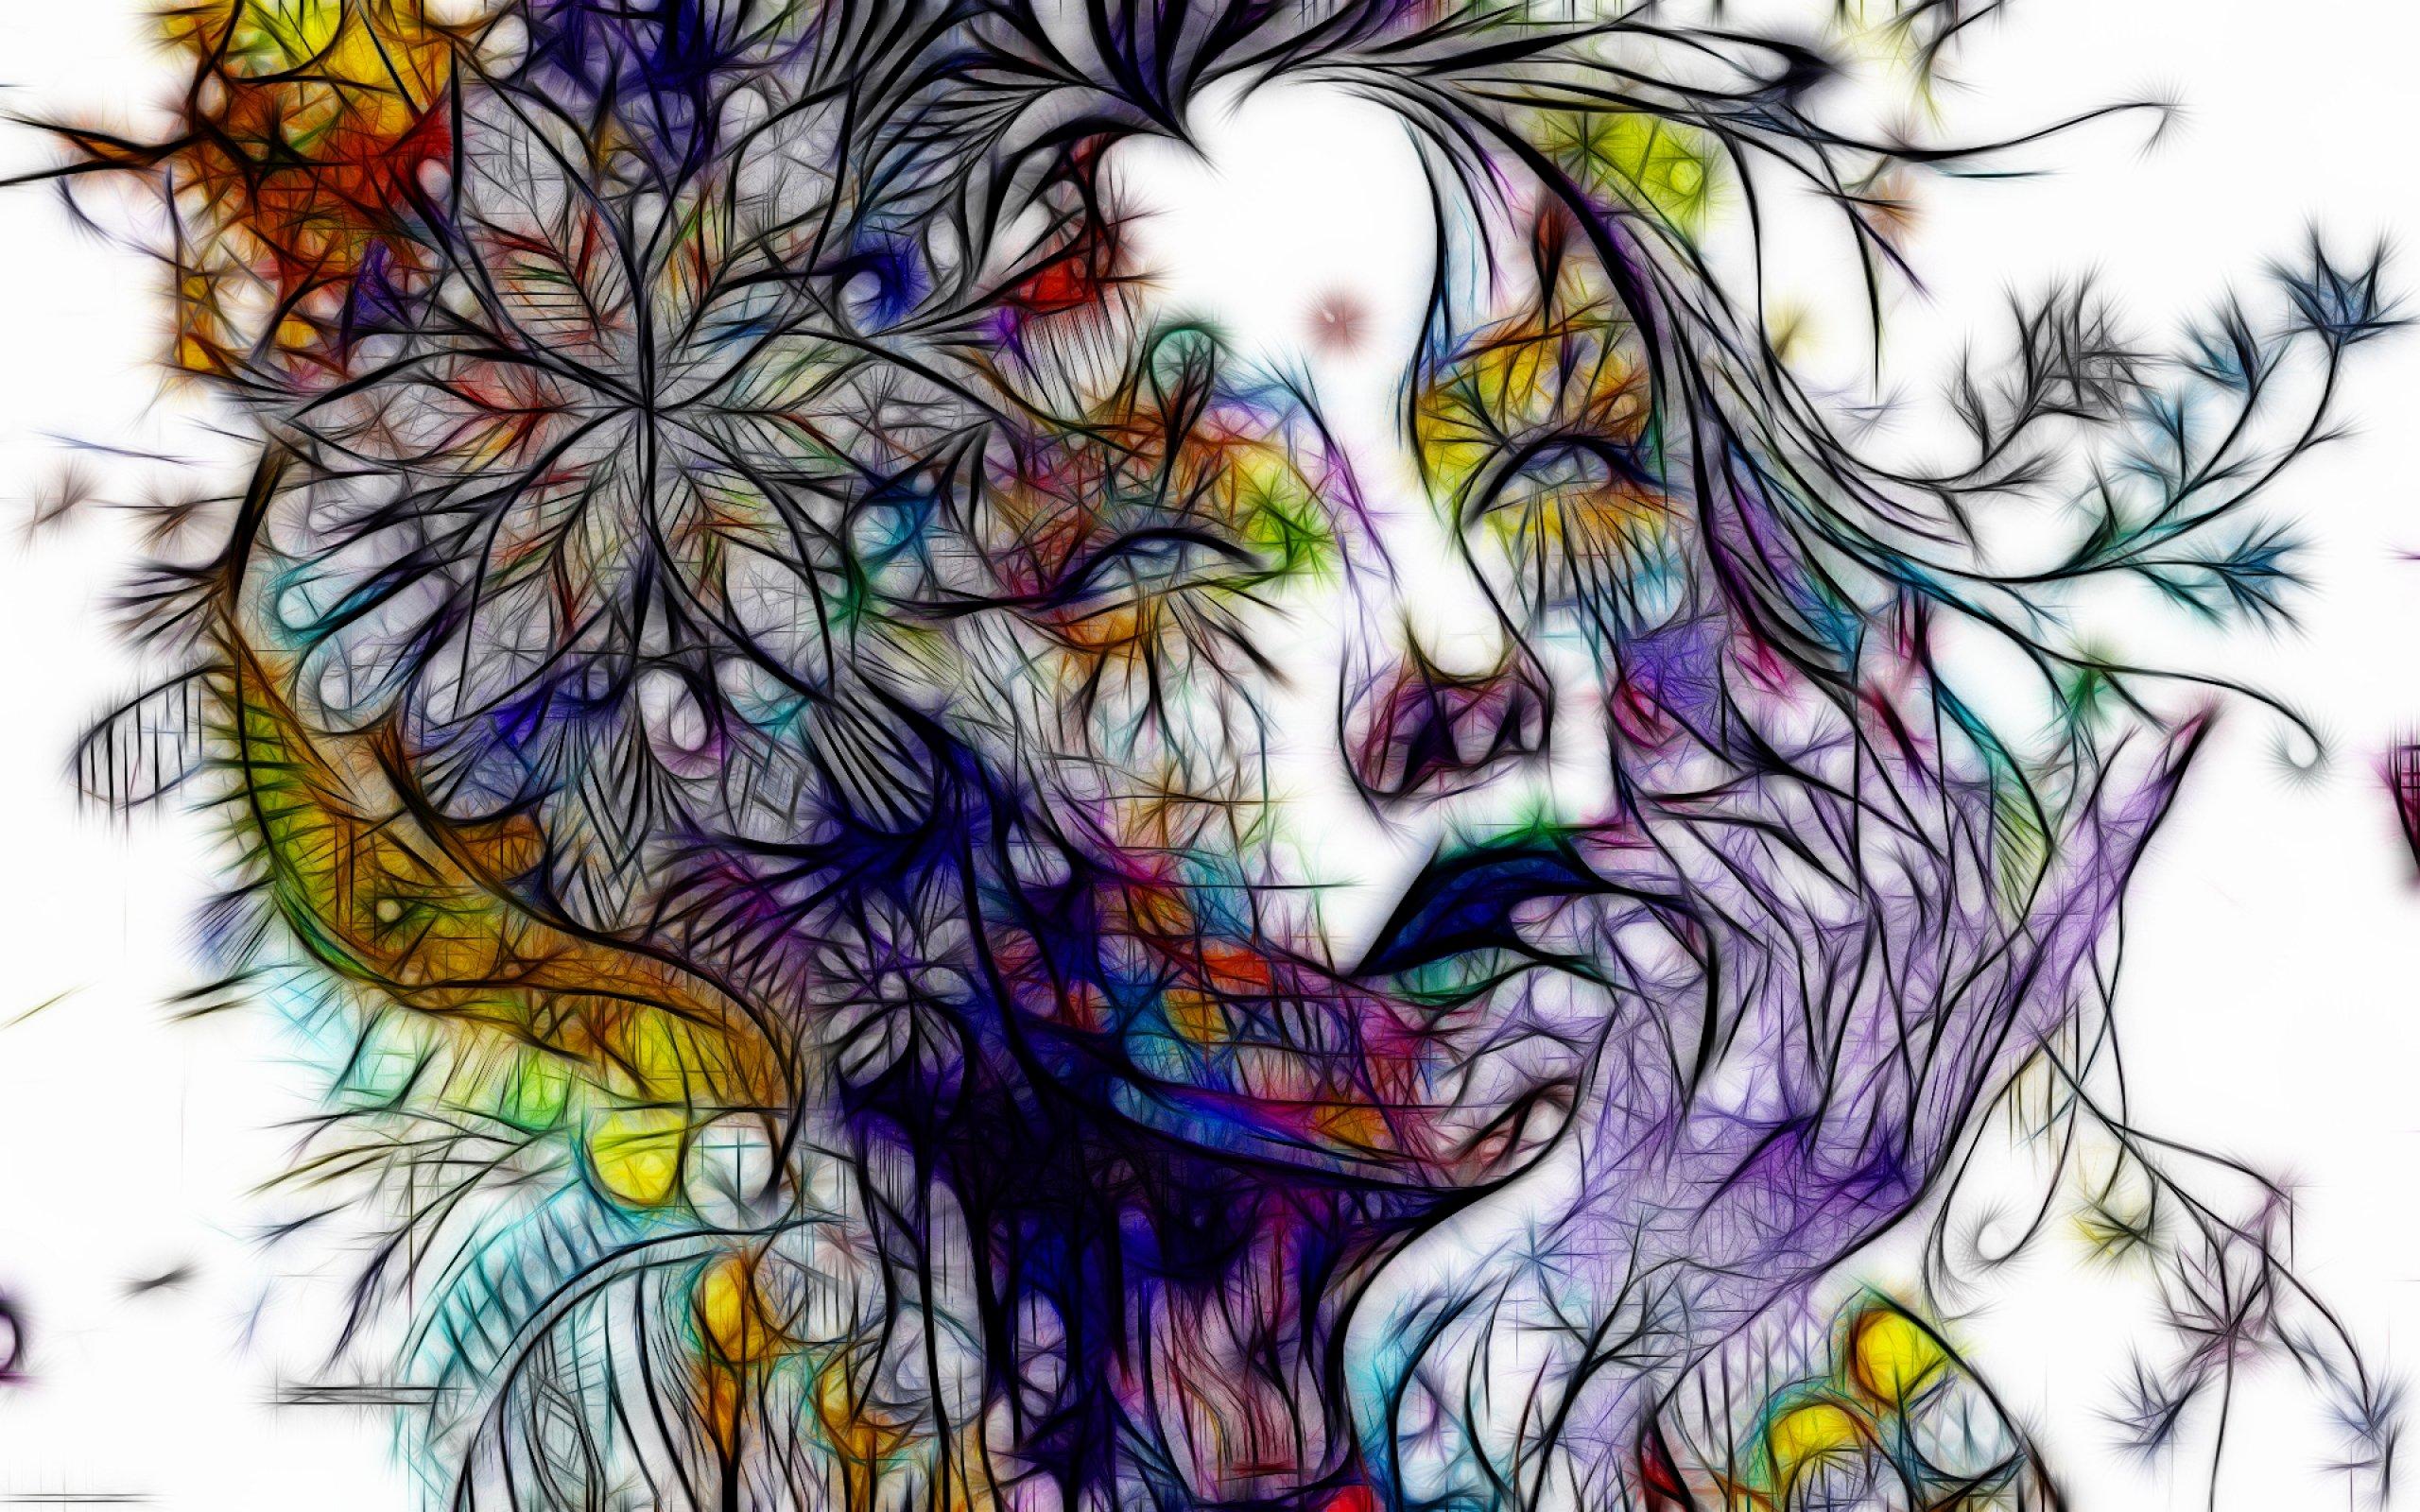 https://wallup.net/artistic-art-artwork-women-woman-girl-girls-female/